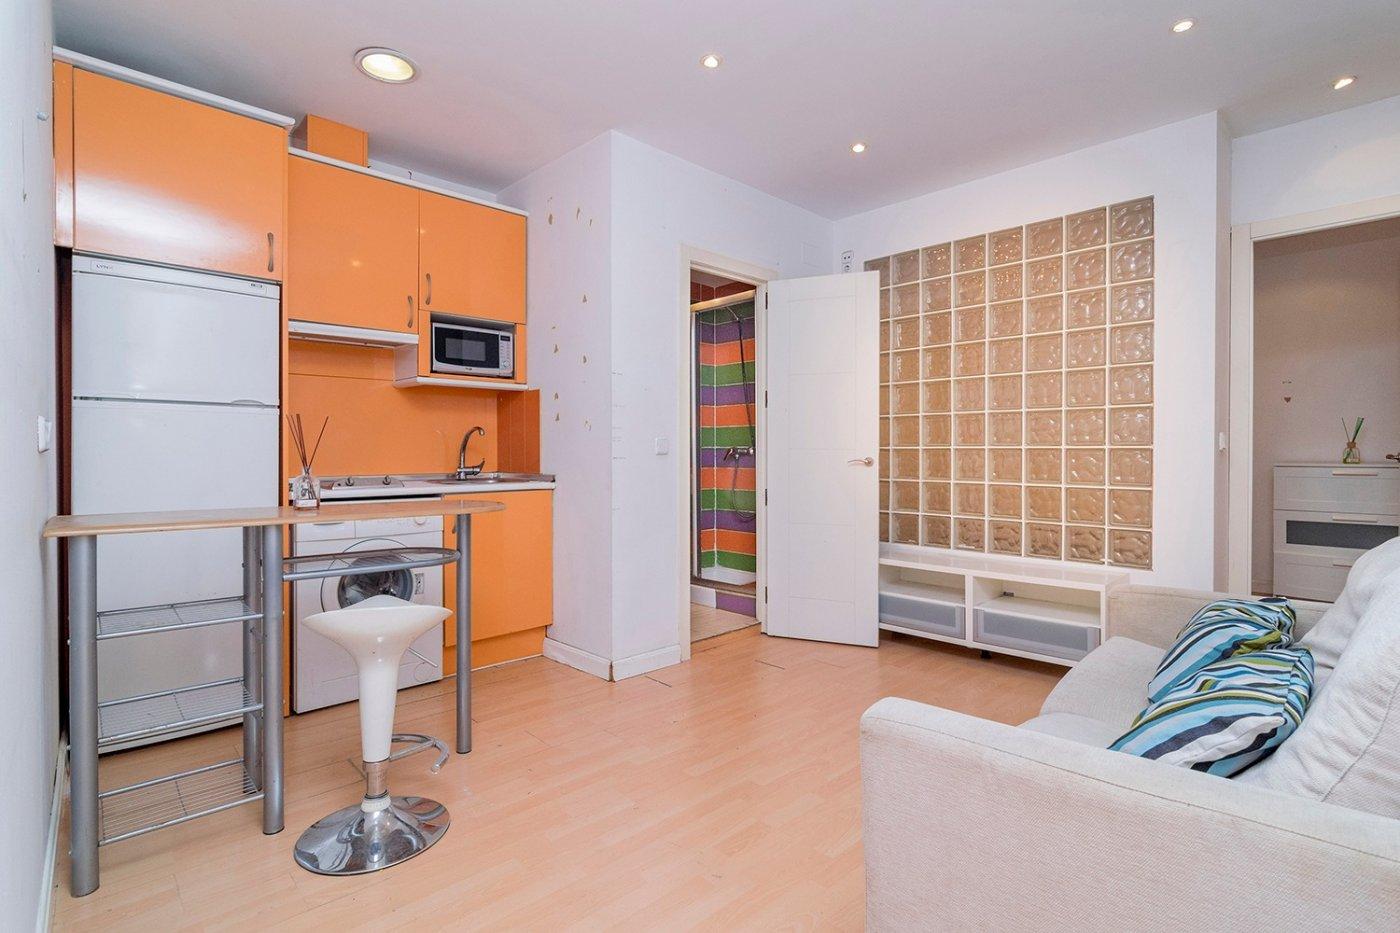 Piso · Madrid · Malasaña 650€ MES€